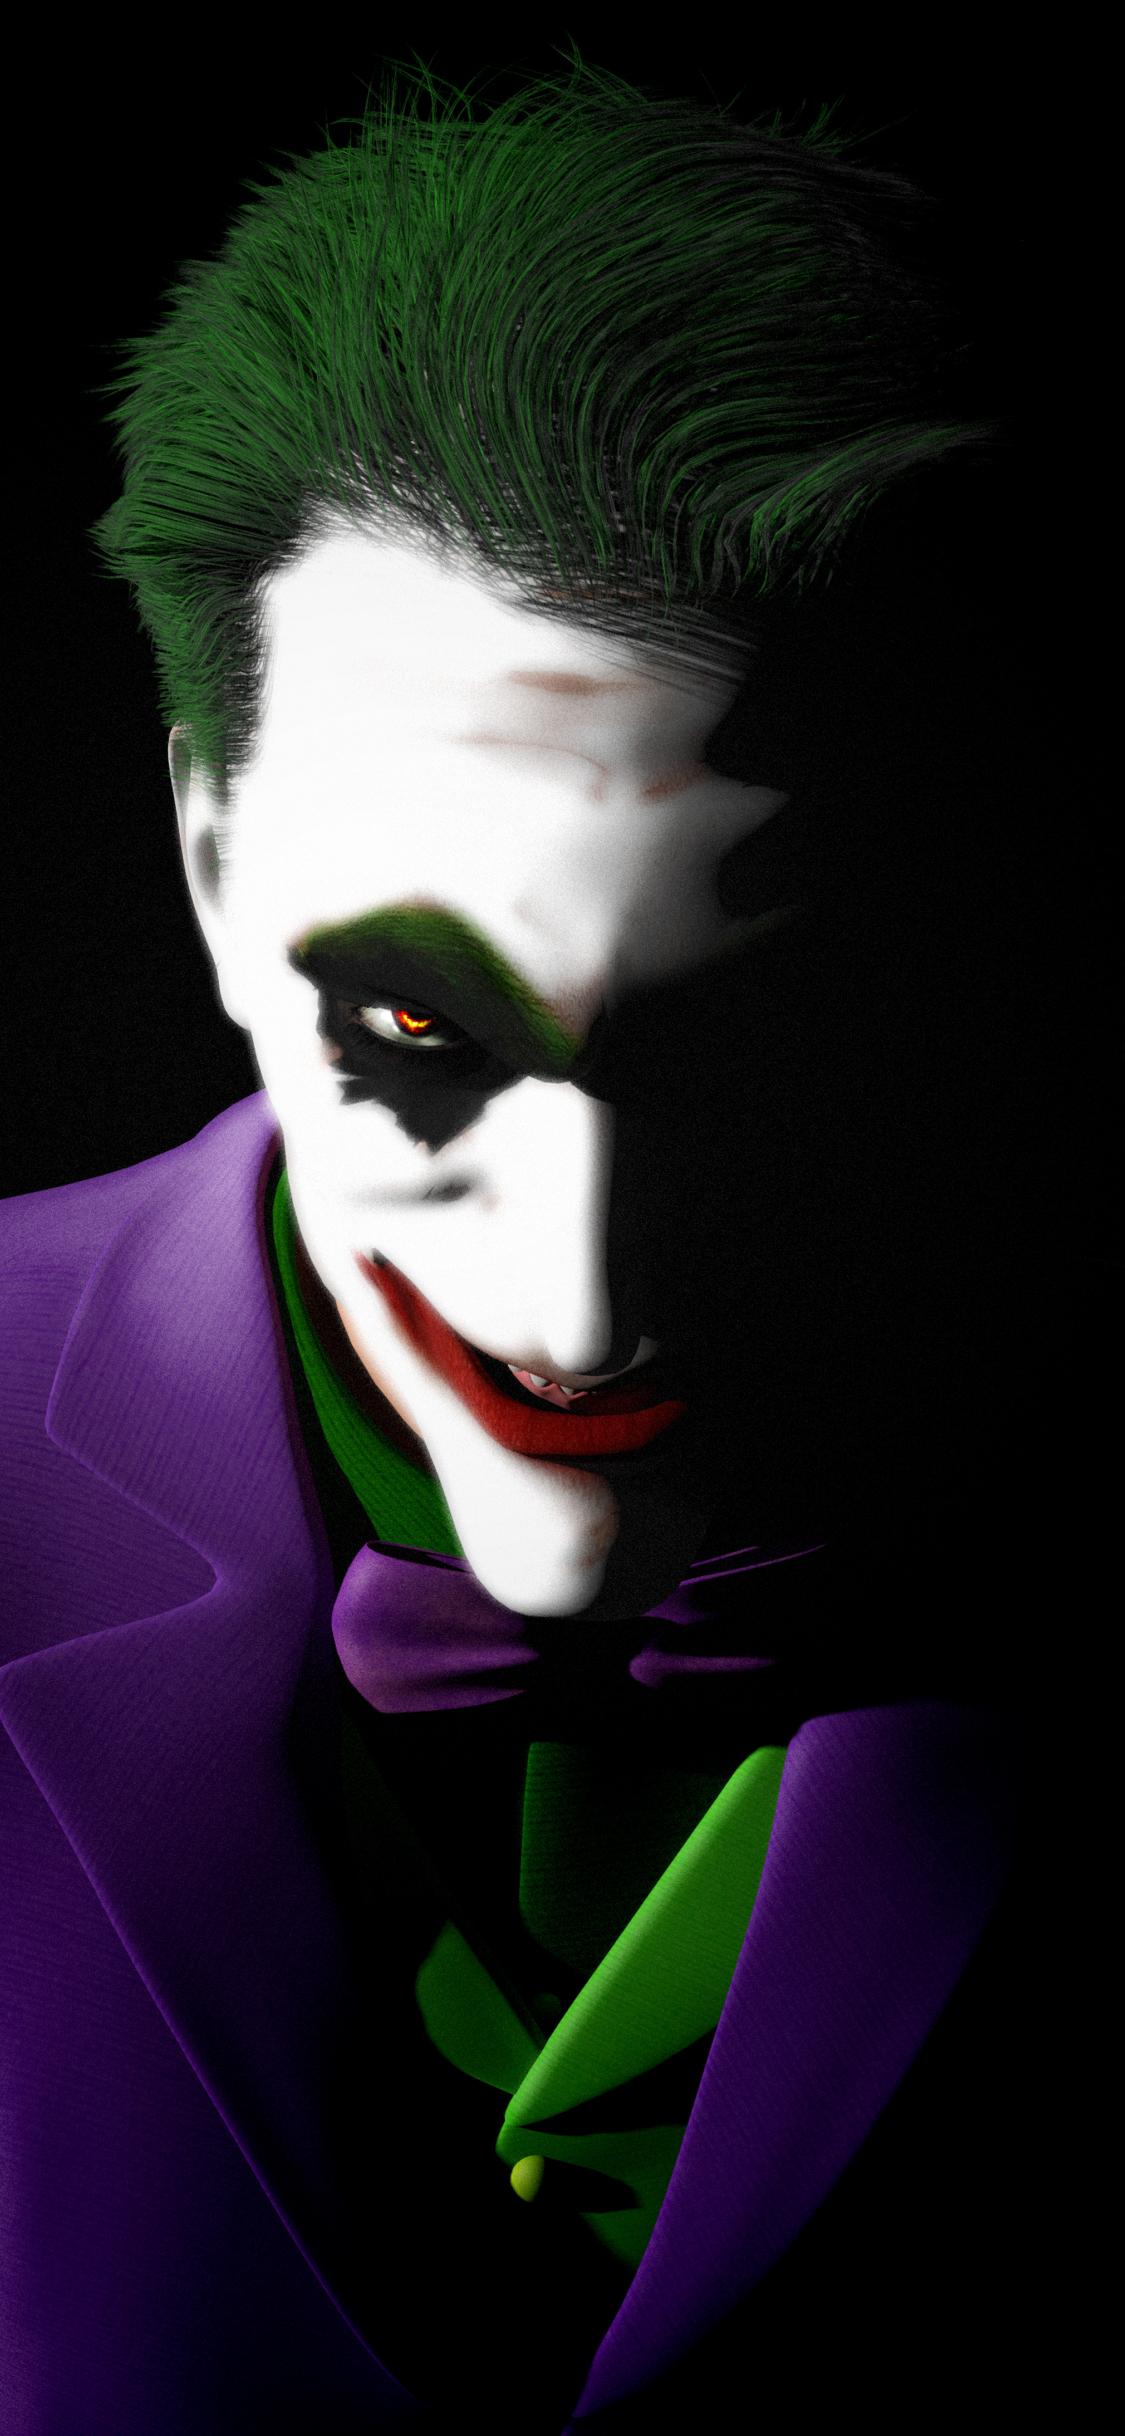 Download 1125x2436 Wallpaper Joker Artwork Dark Super